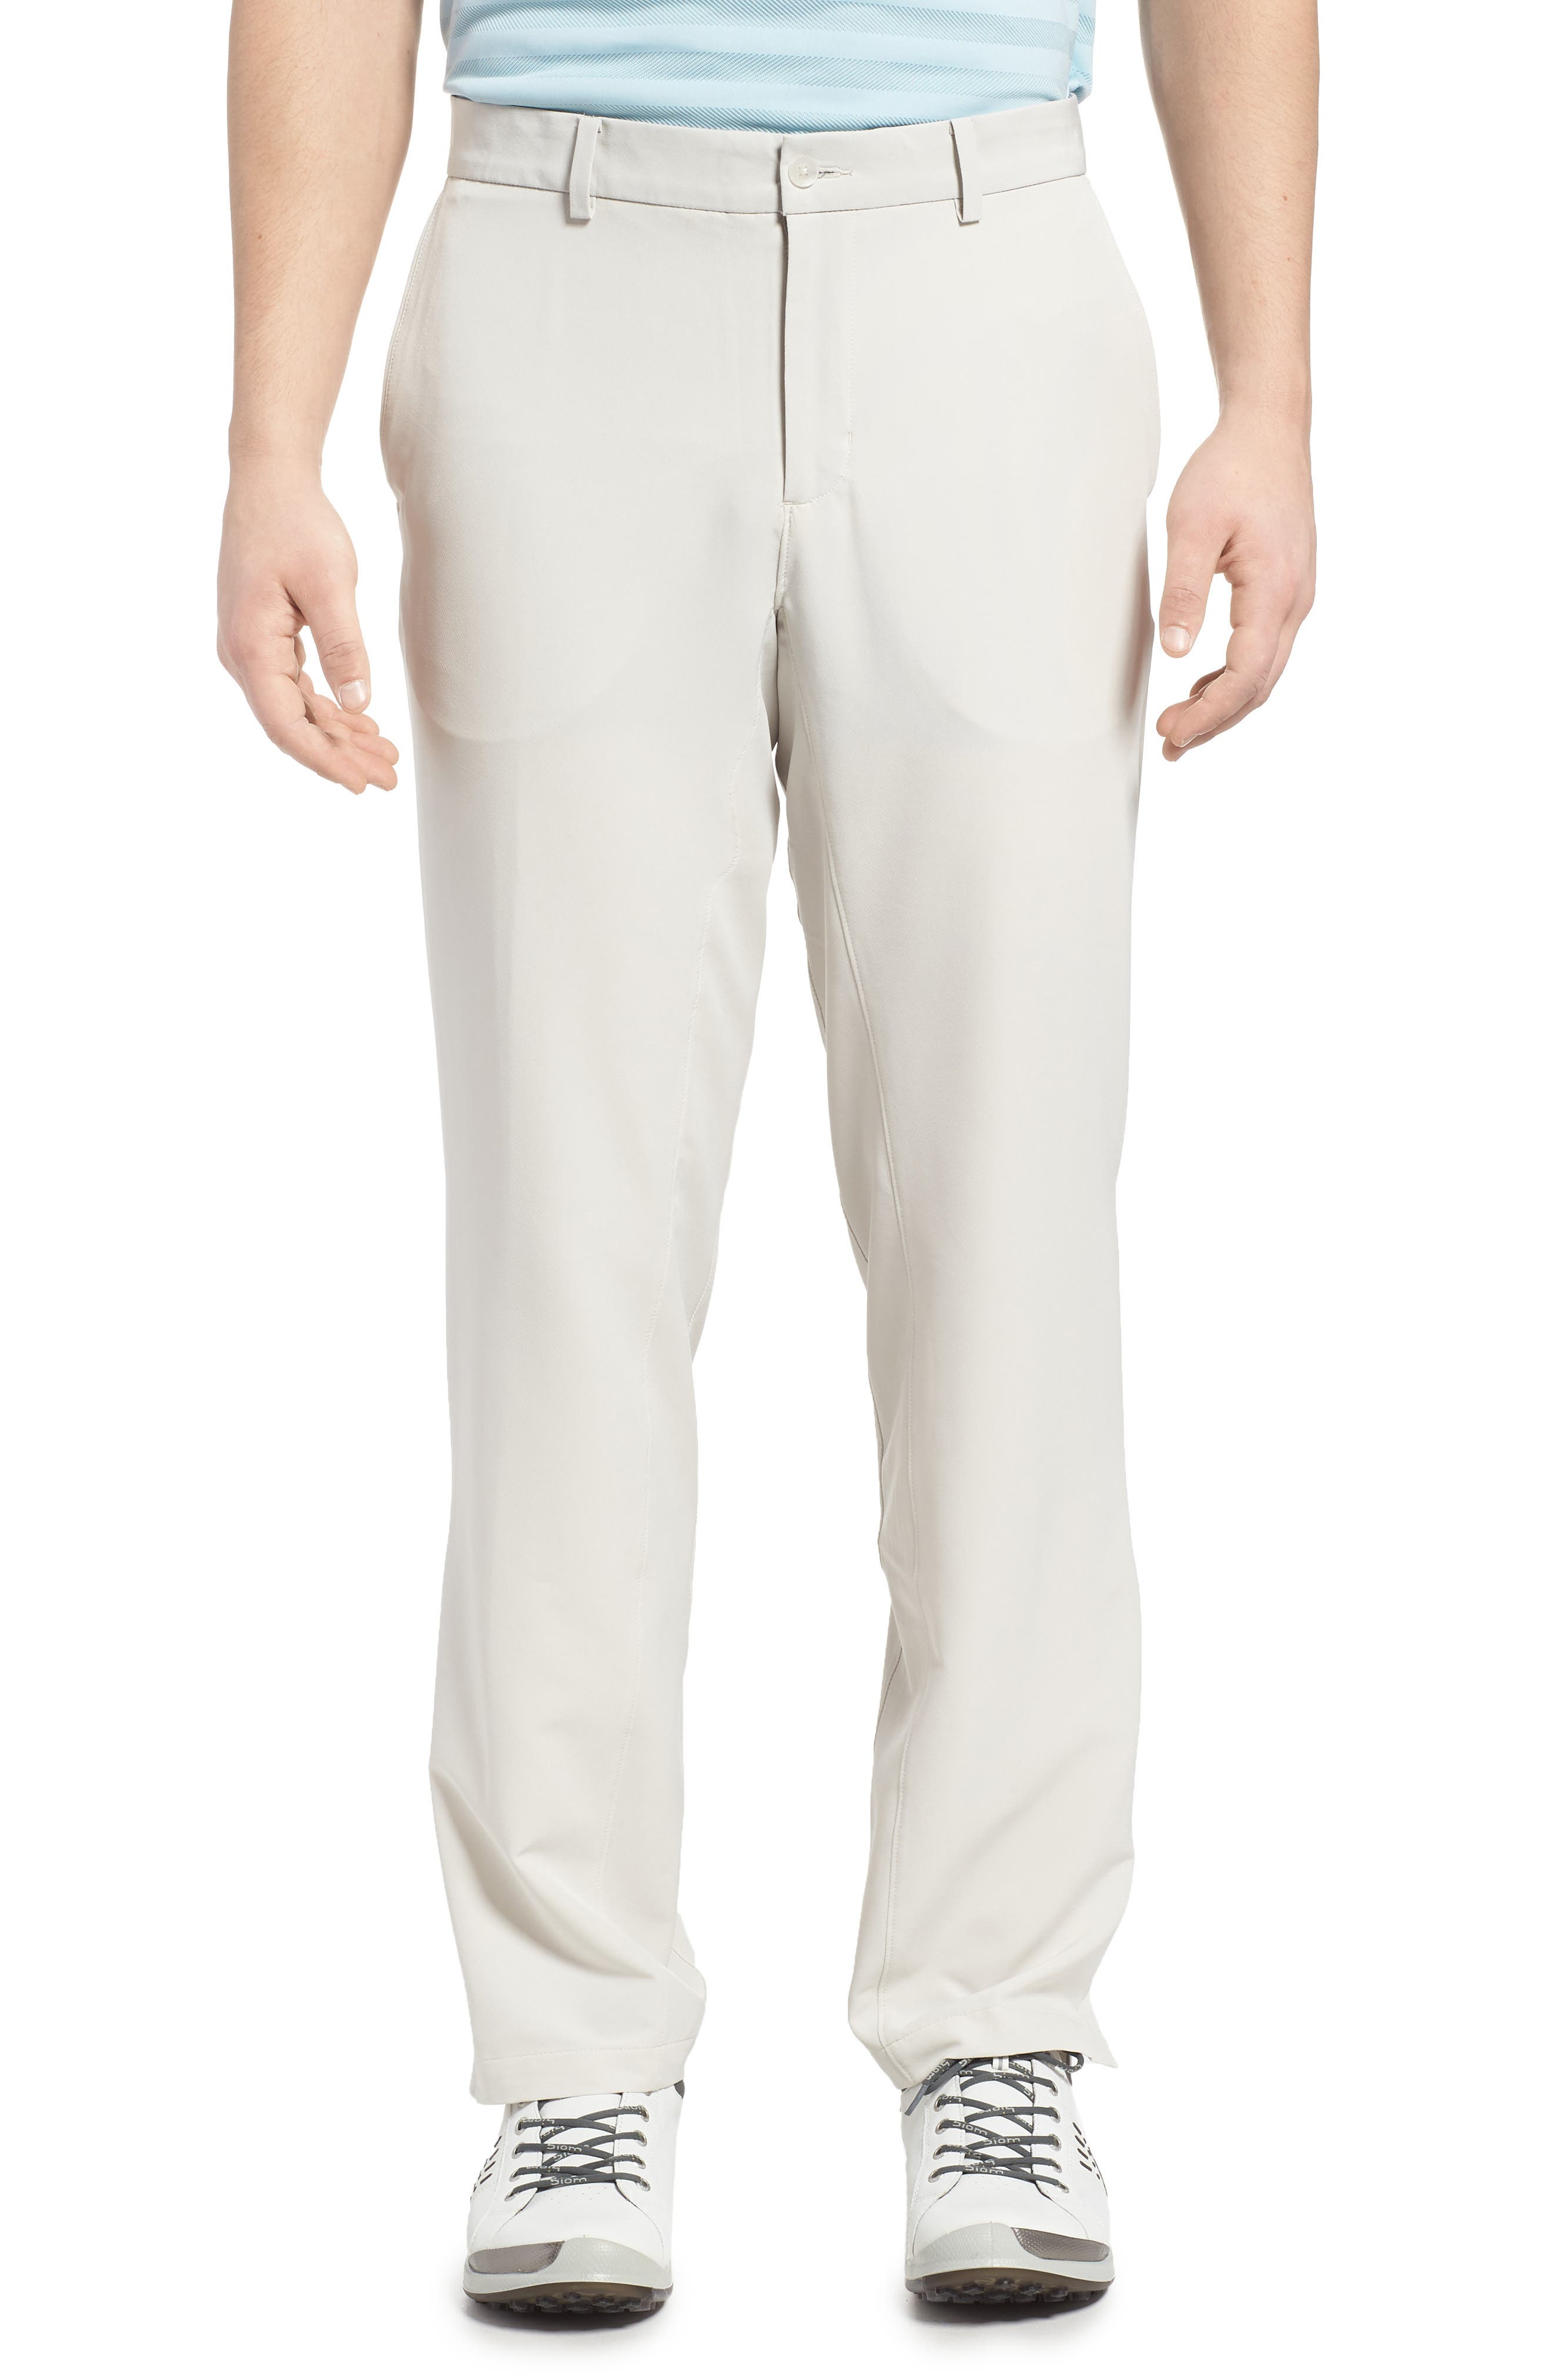 Alternate Image 1 Selected - Nike Hybrid Flex Golf Pants